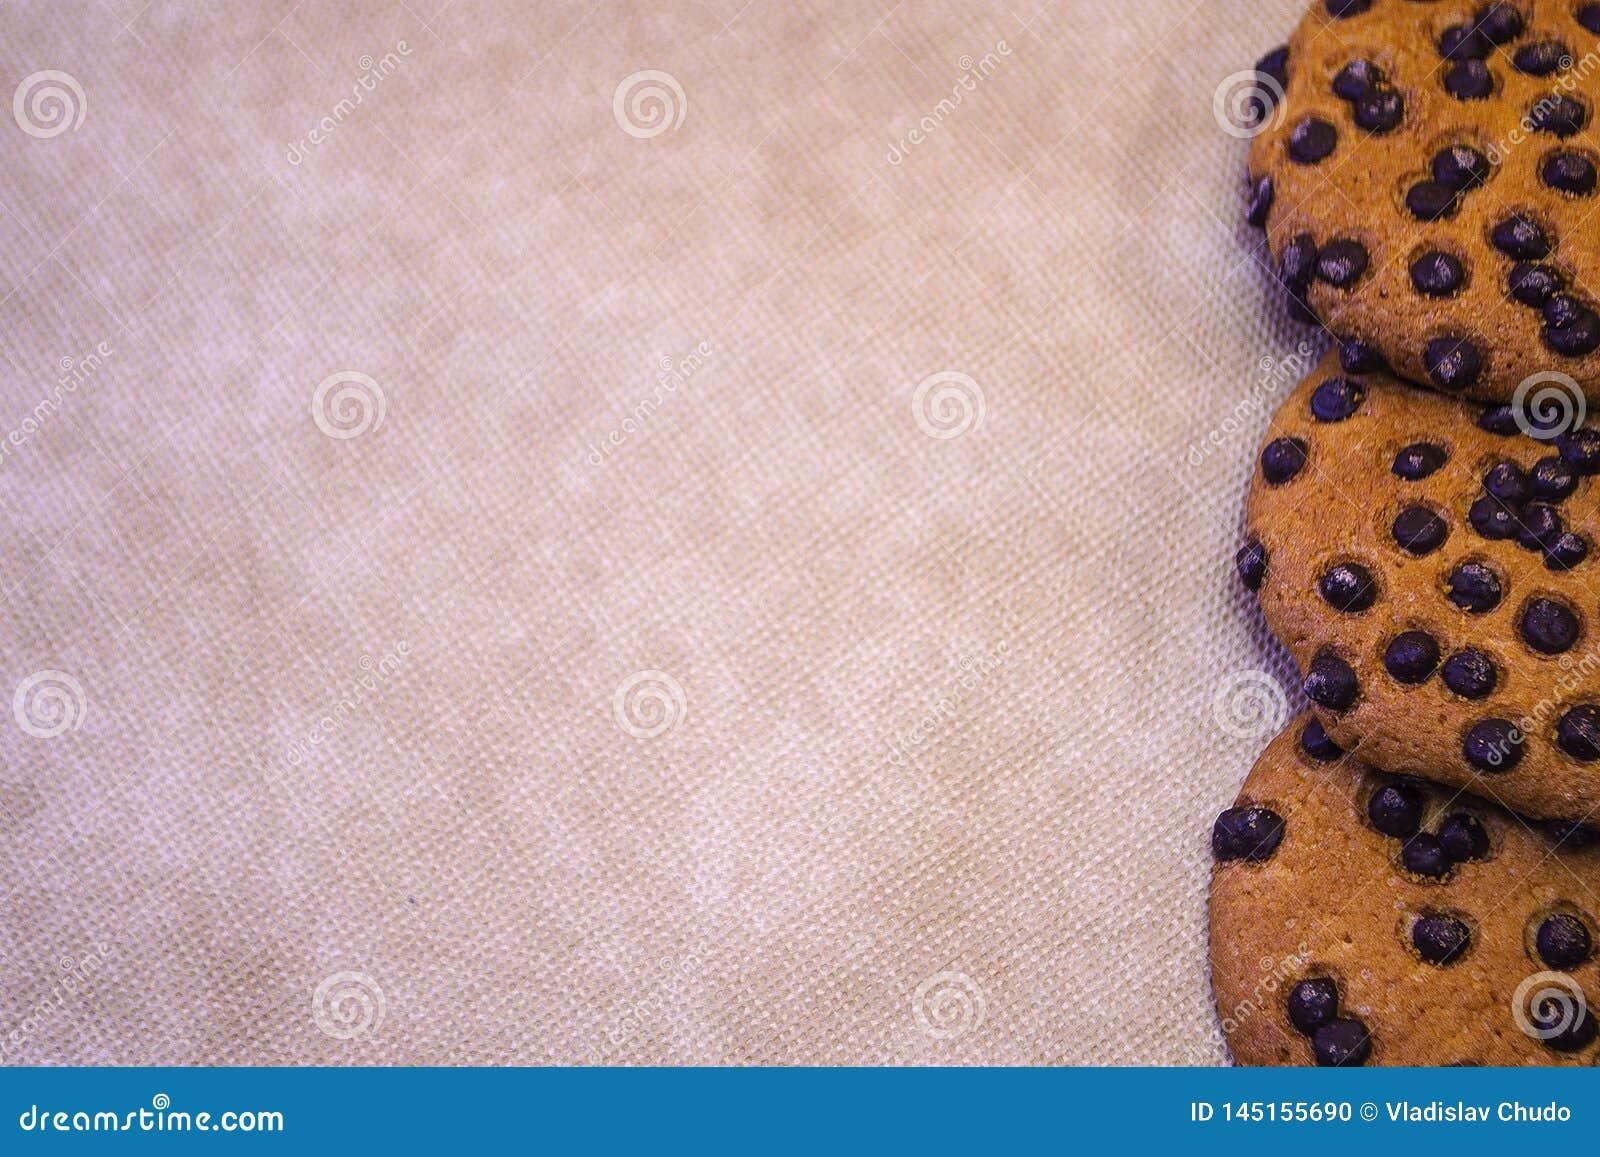 Cookies, wonderful and useful food